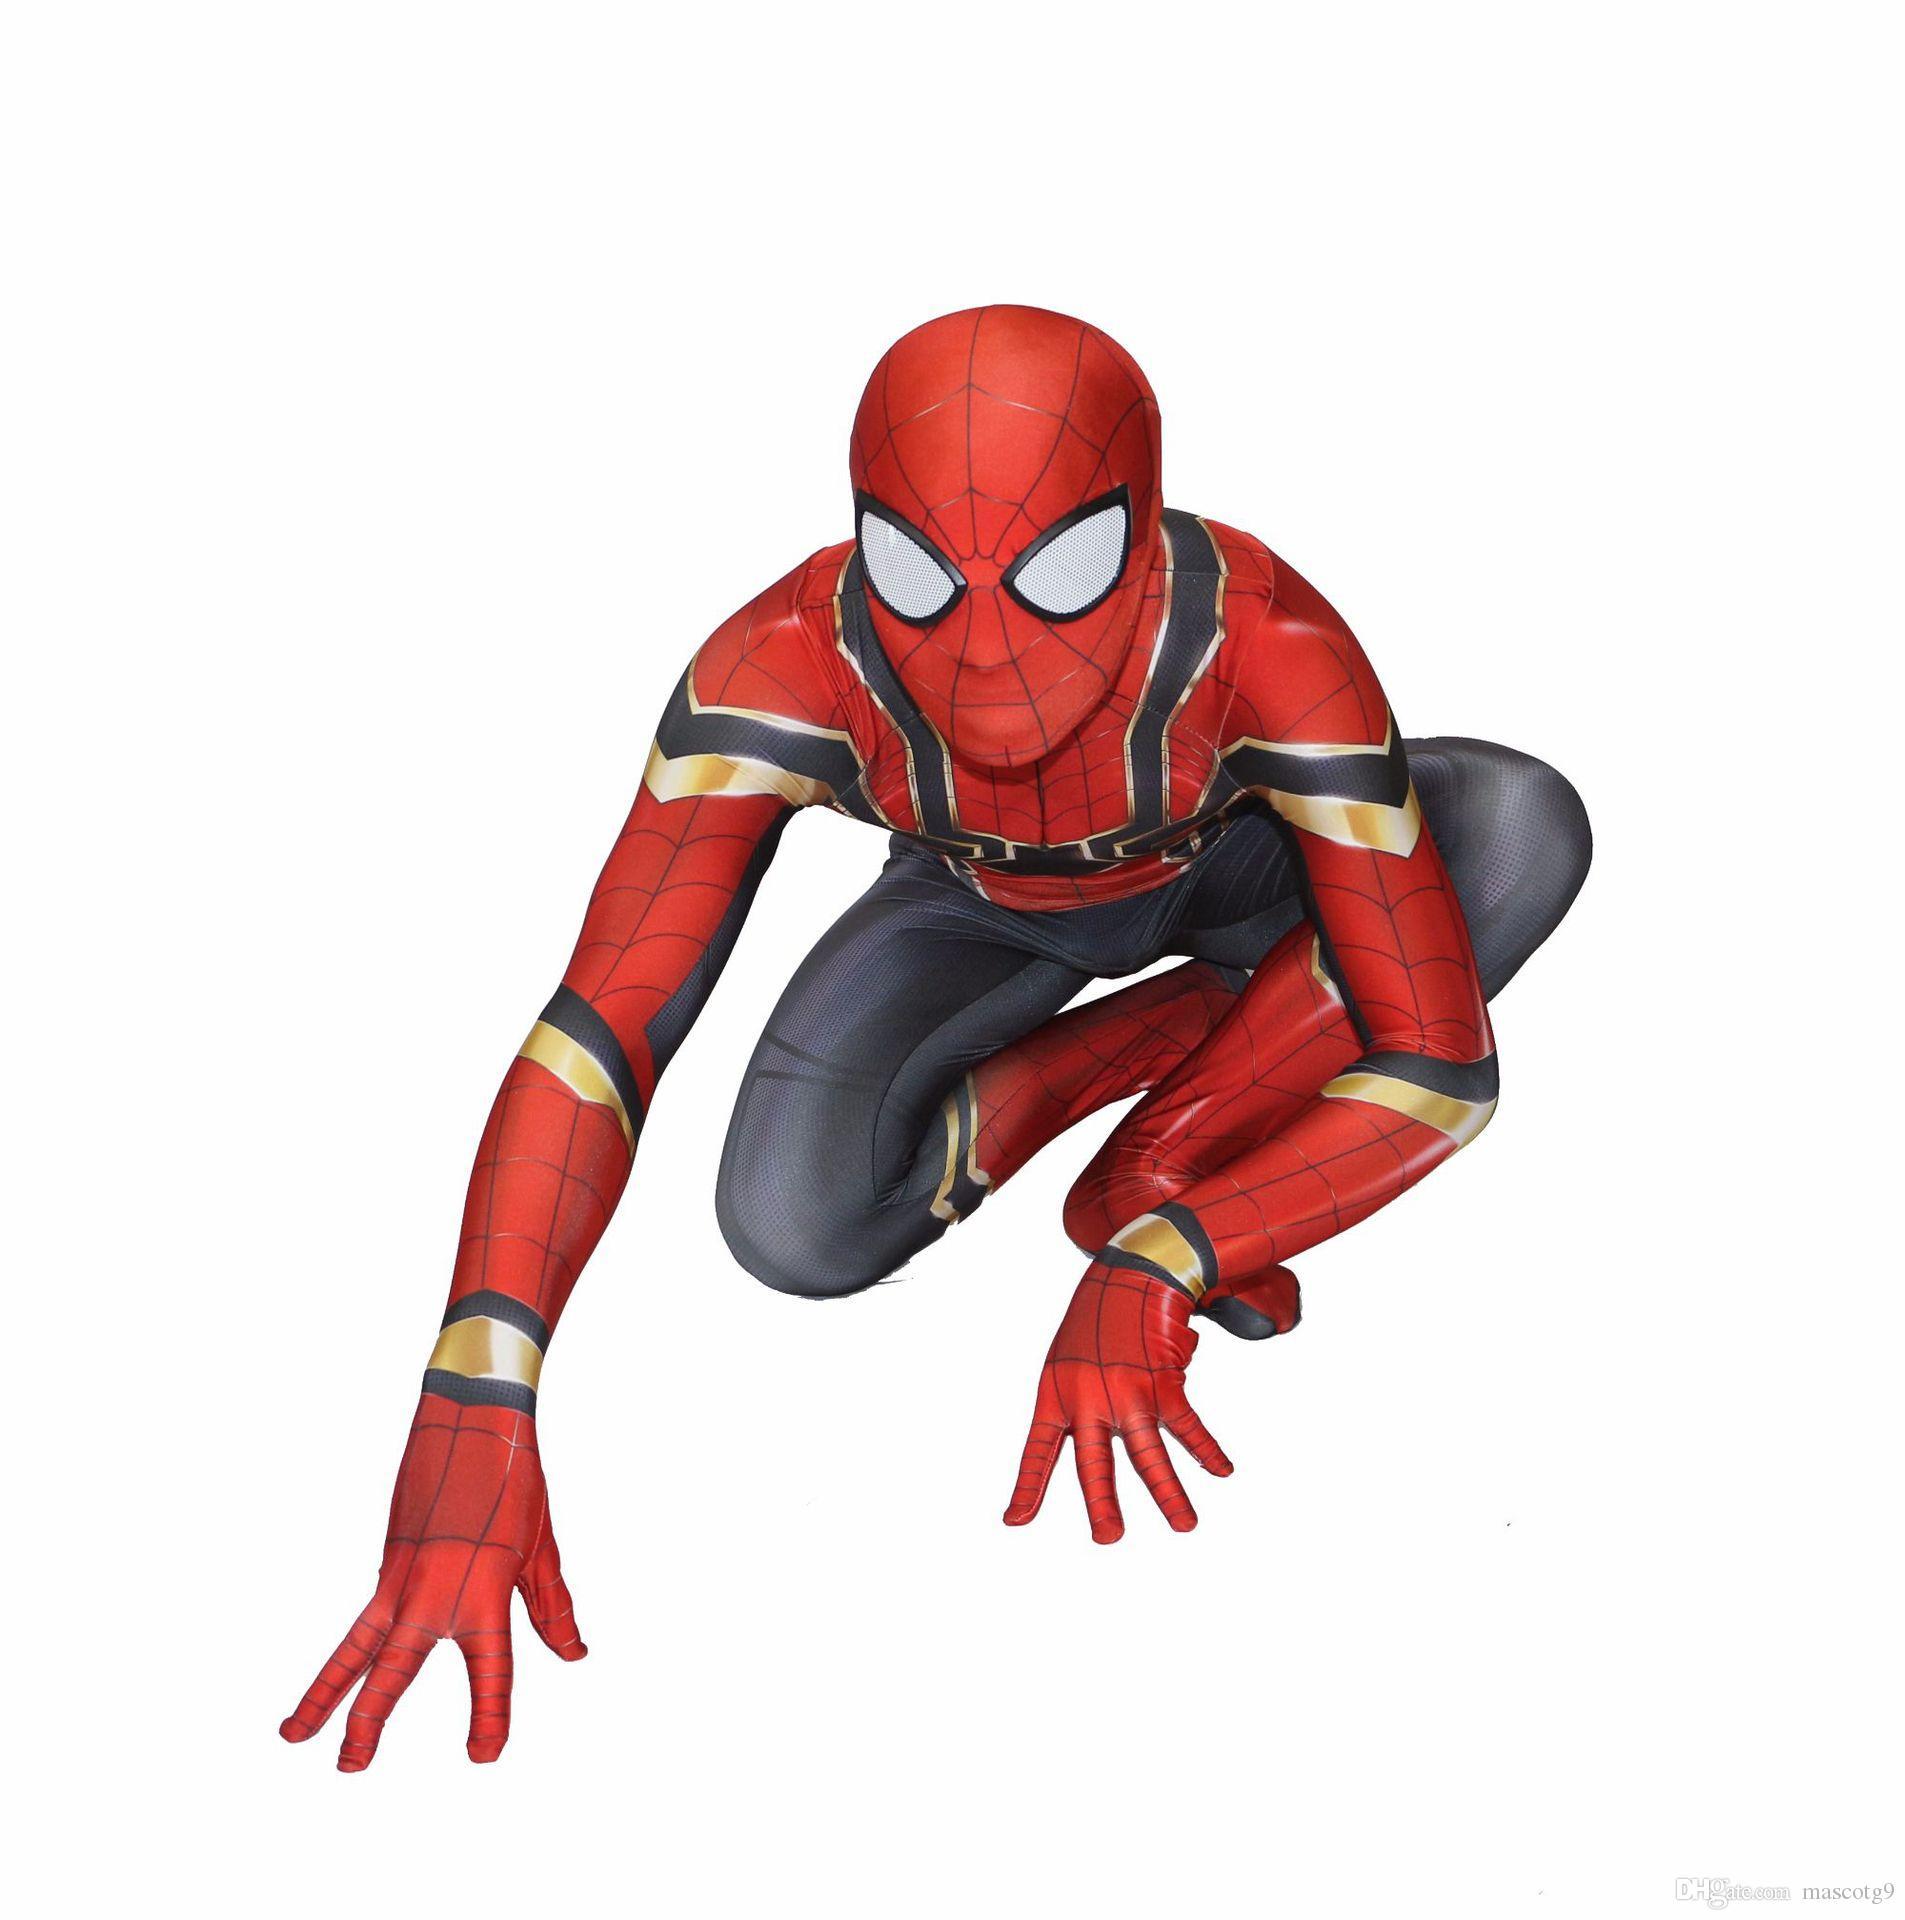 Hot Sale High Quality Mens adult Halloween Spiderman costume Lycra zentai SuperHero Theme Costume cosplay Full Body Suit